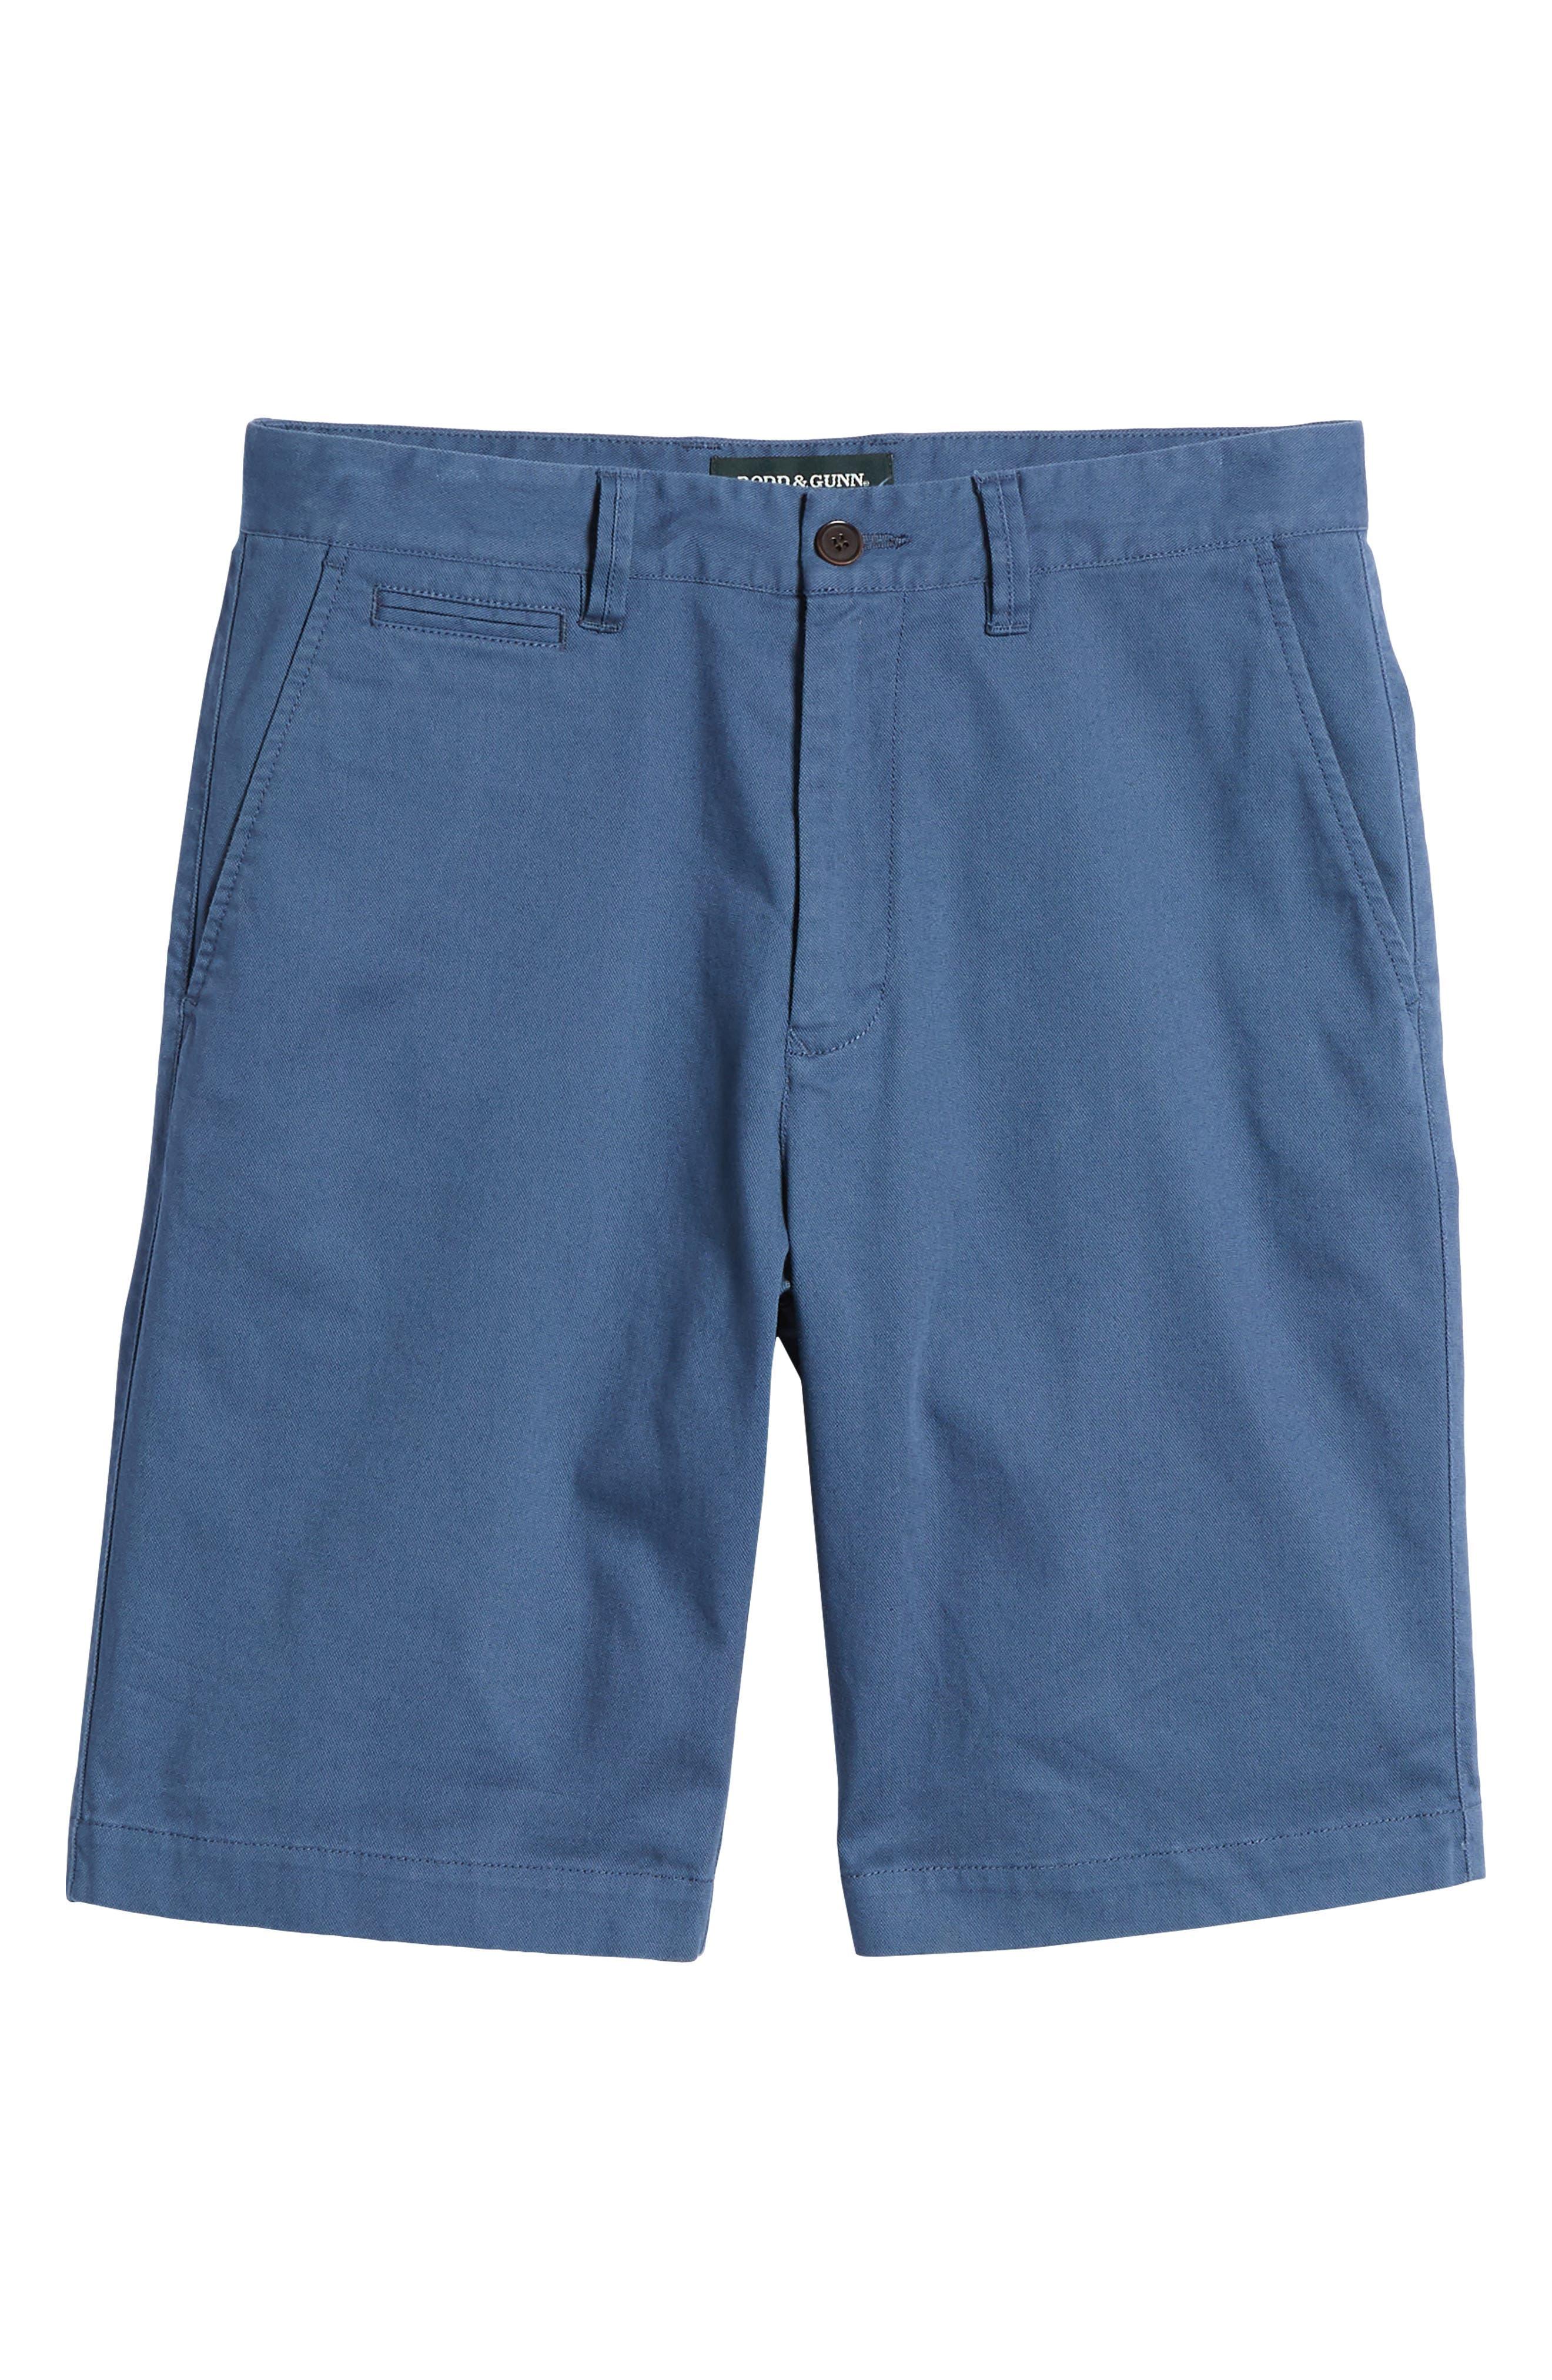 Driving Creek Regular Fit Flat Front Shorts,                             Alternate thumbnail 6, color,                             Dusk